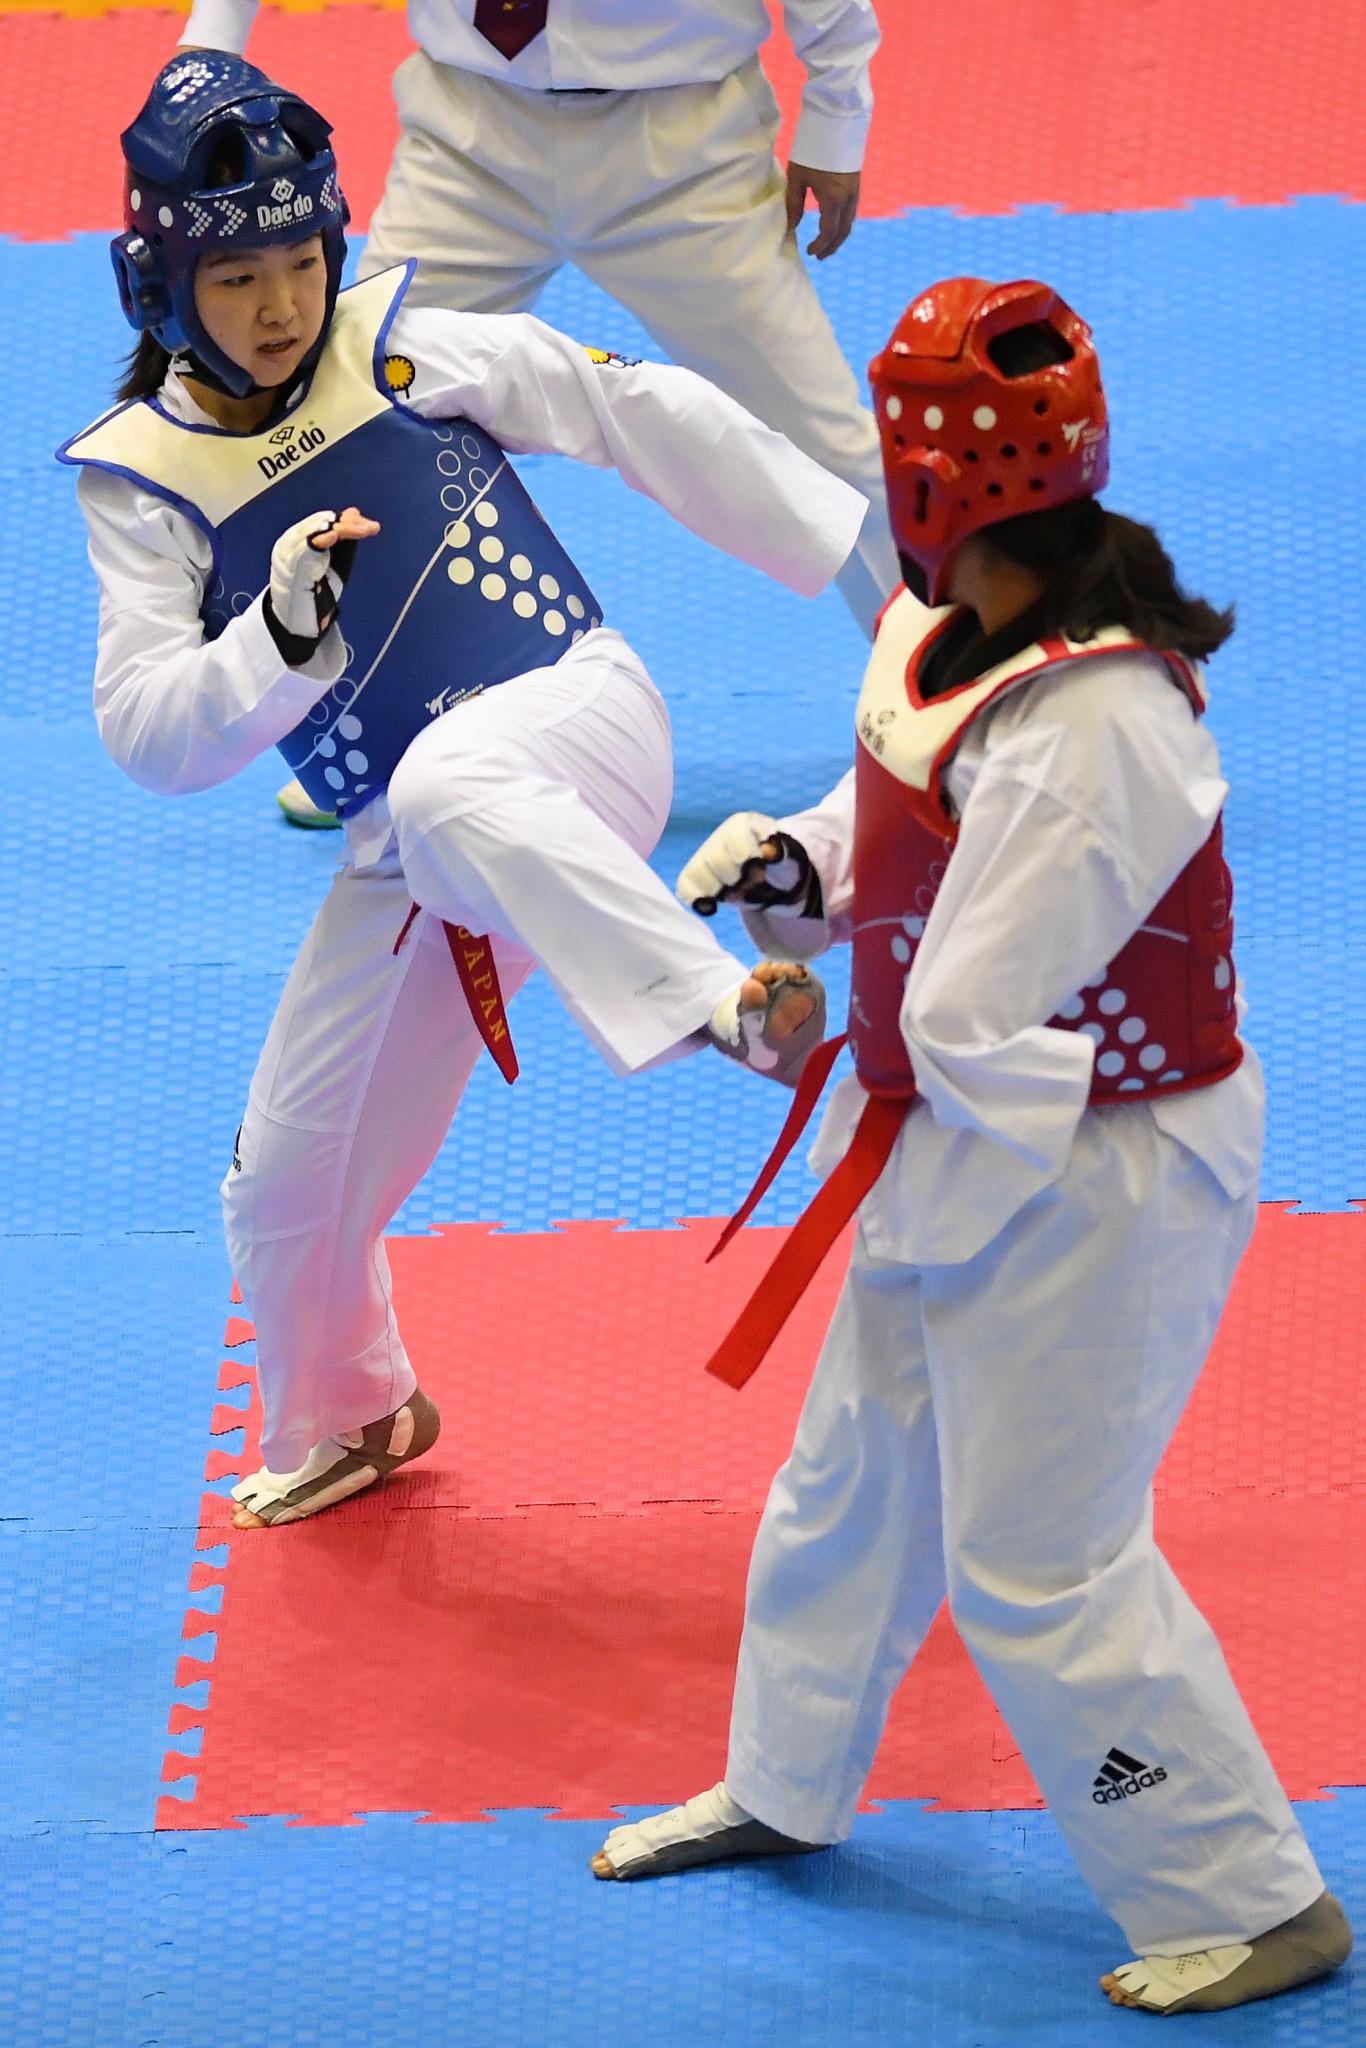 Shoko Ota aims to put Para-taekwondo on the map in Japan at Tokyo 2020